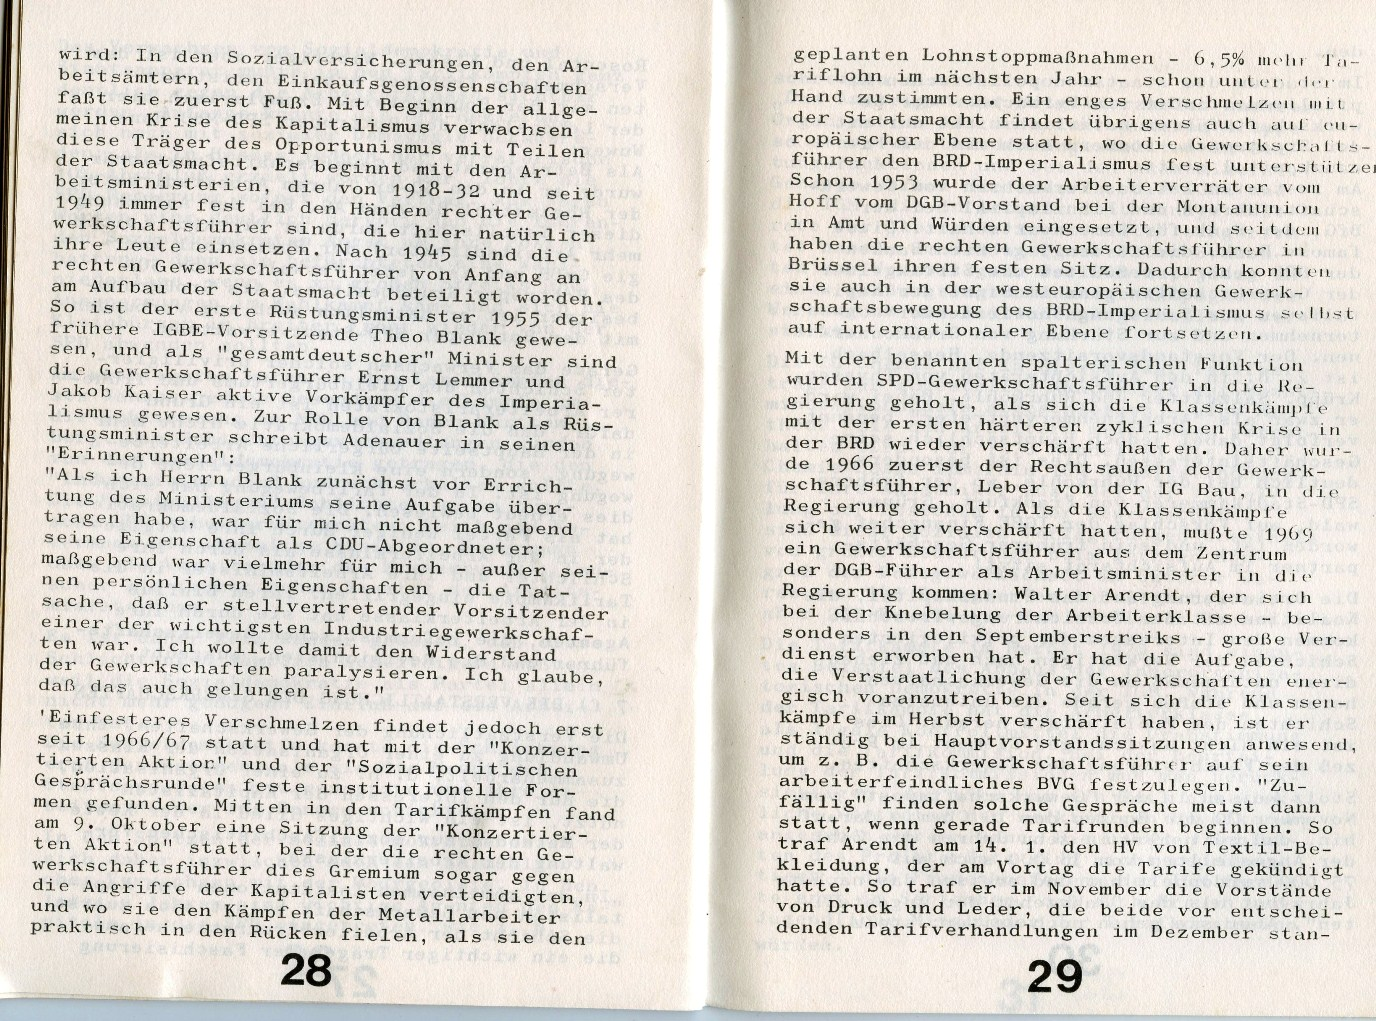 KJVD_Sozialdemokratie_Sozialfaschismus_1971_16